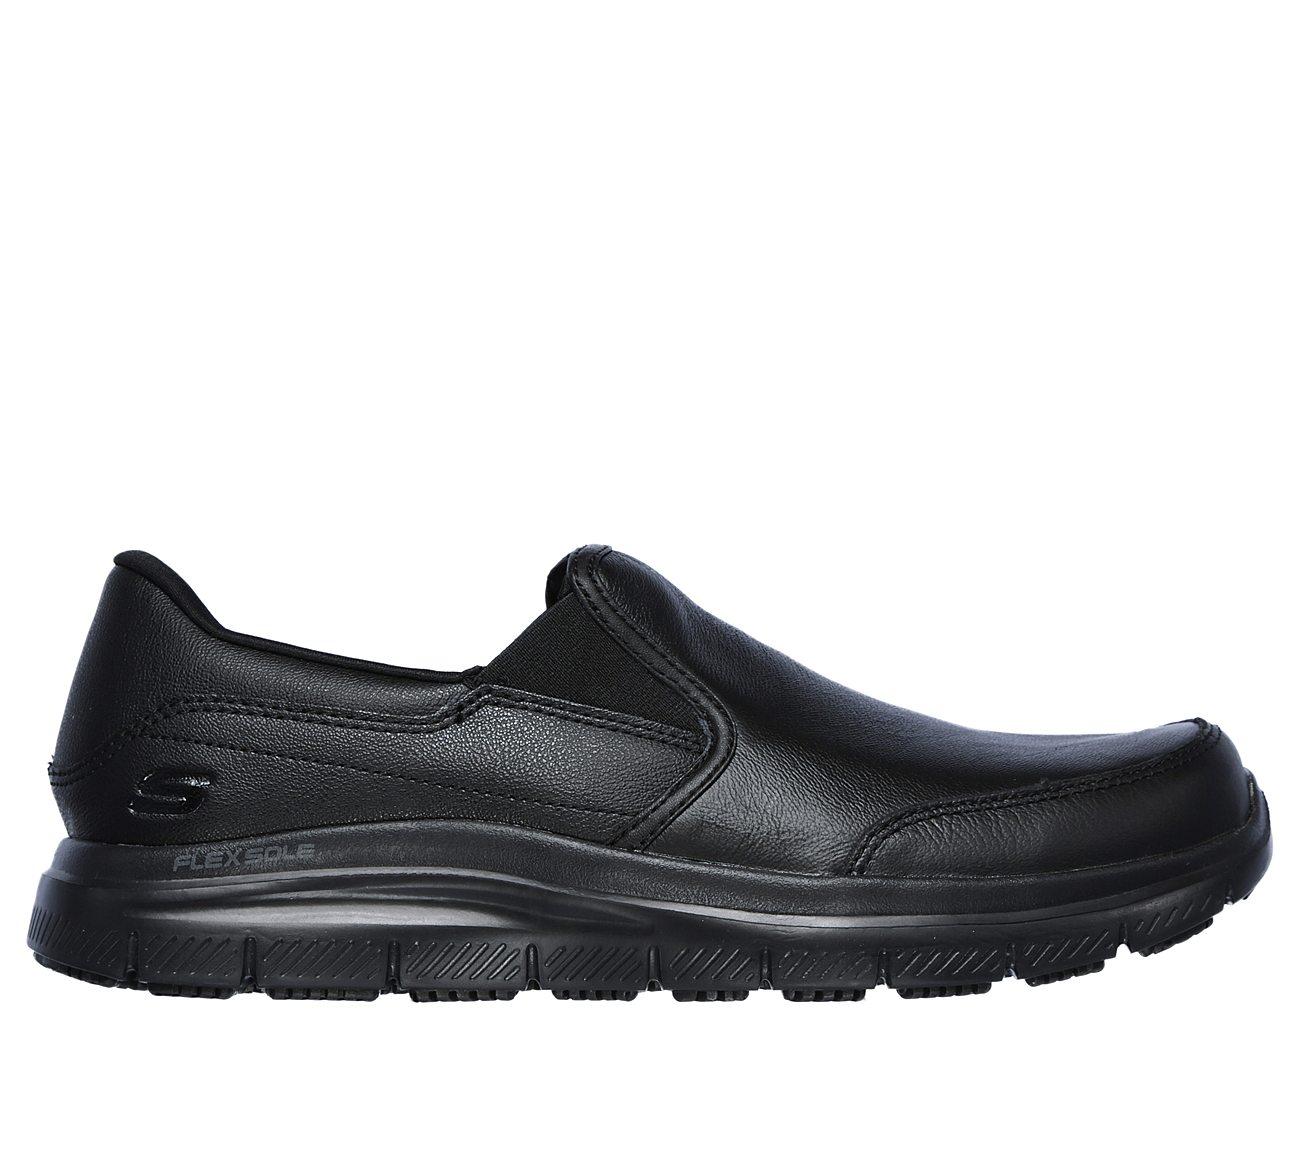 bronwood men Skechers work メンズ フレックス advantage sr - bronwood ブラック レザー loafer 12 d (m) (海外取寄せ品)ちょっと贅沢な,靴は最安値に挑戦.